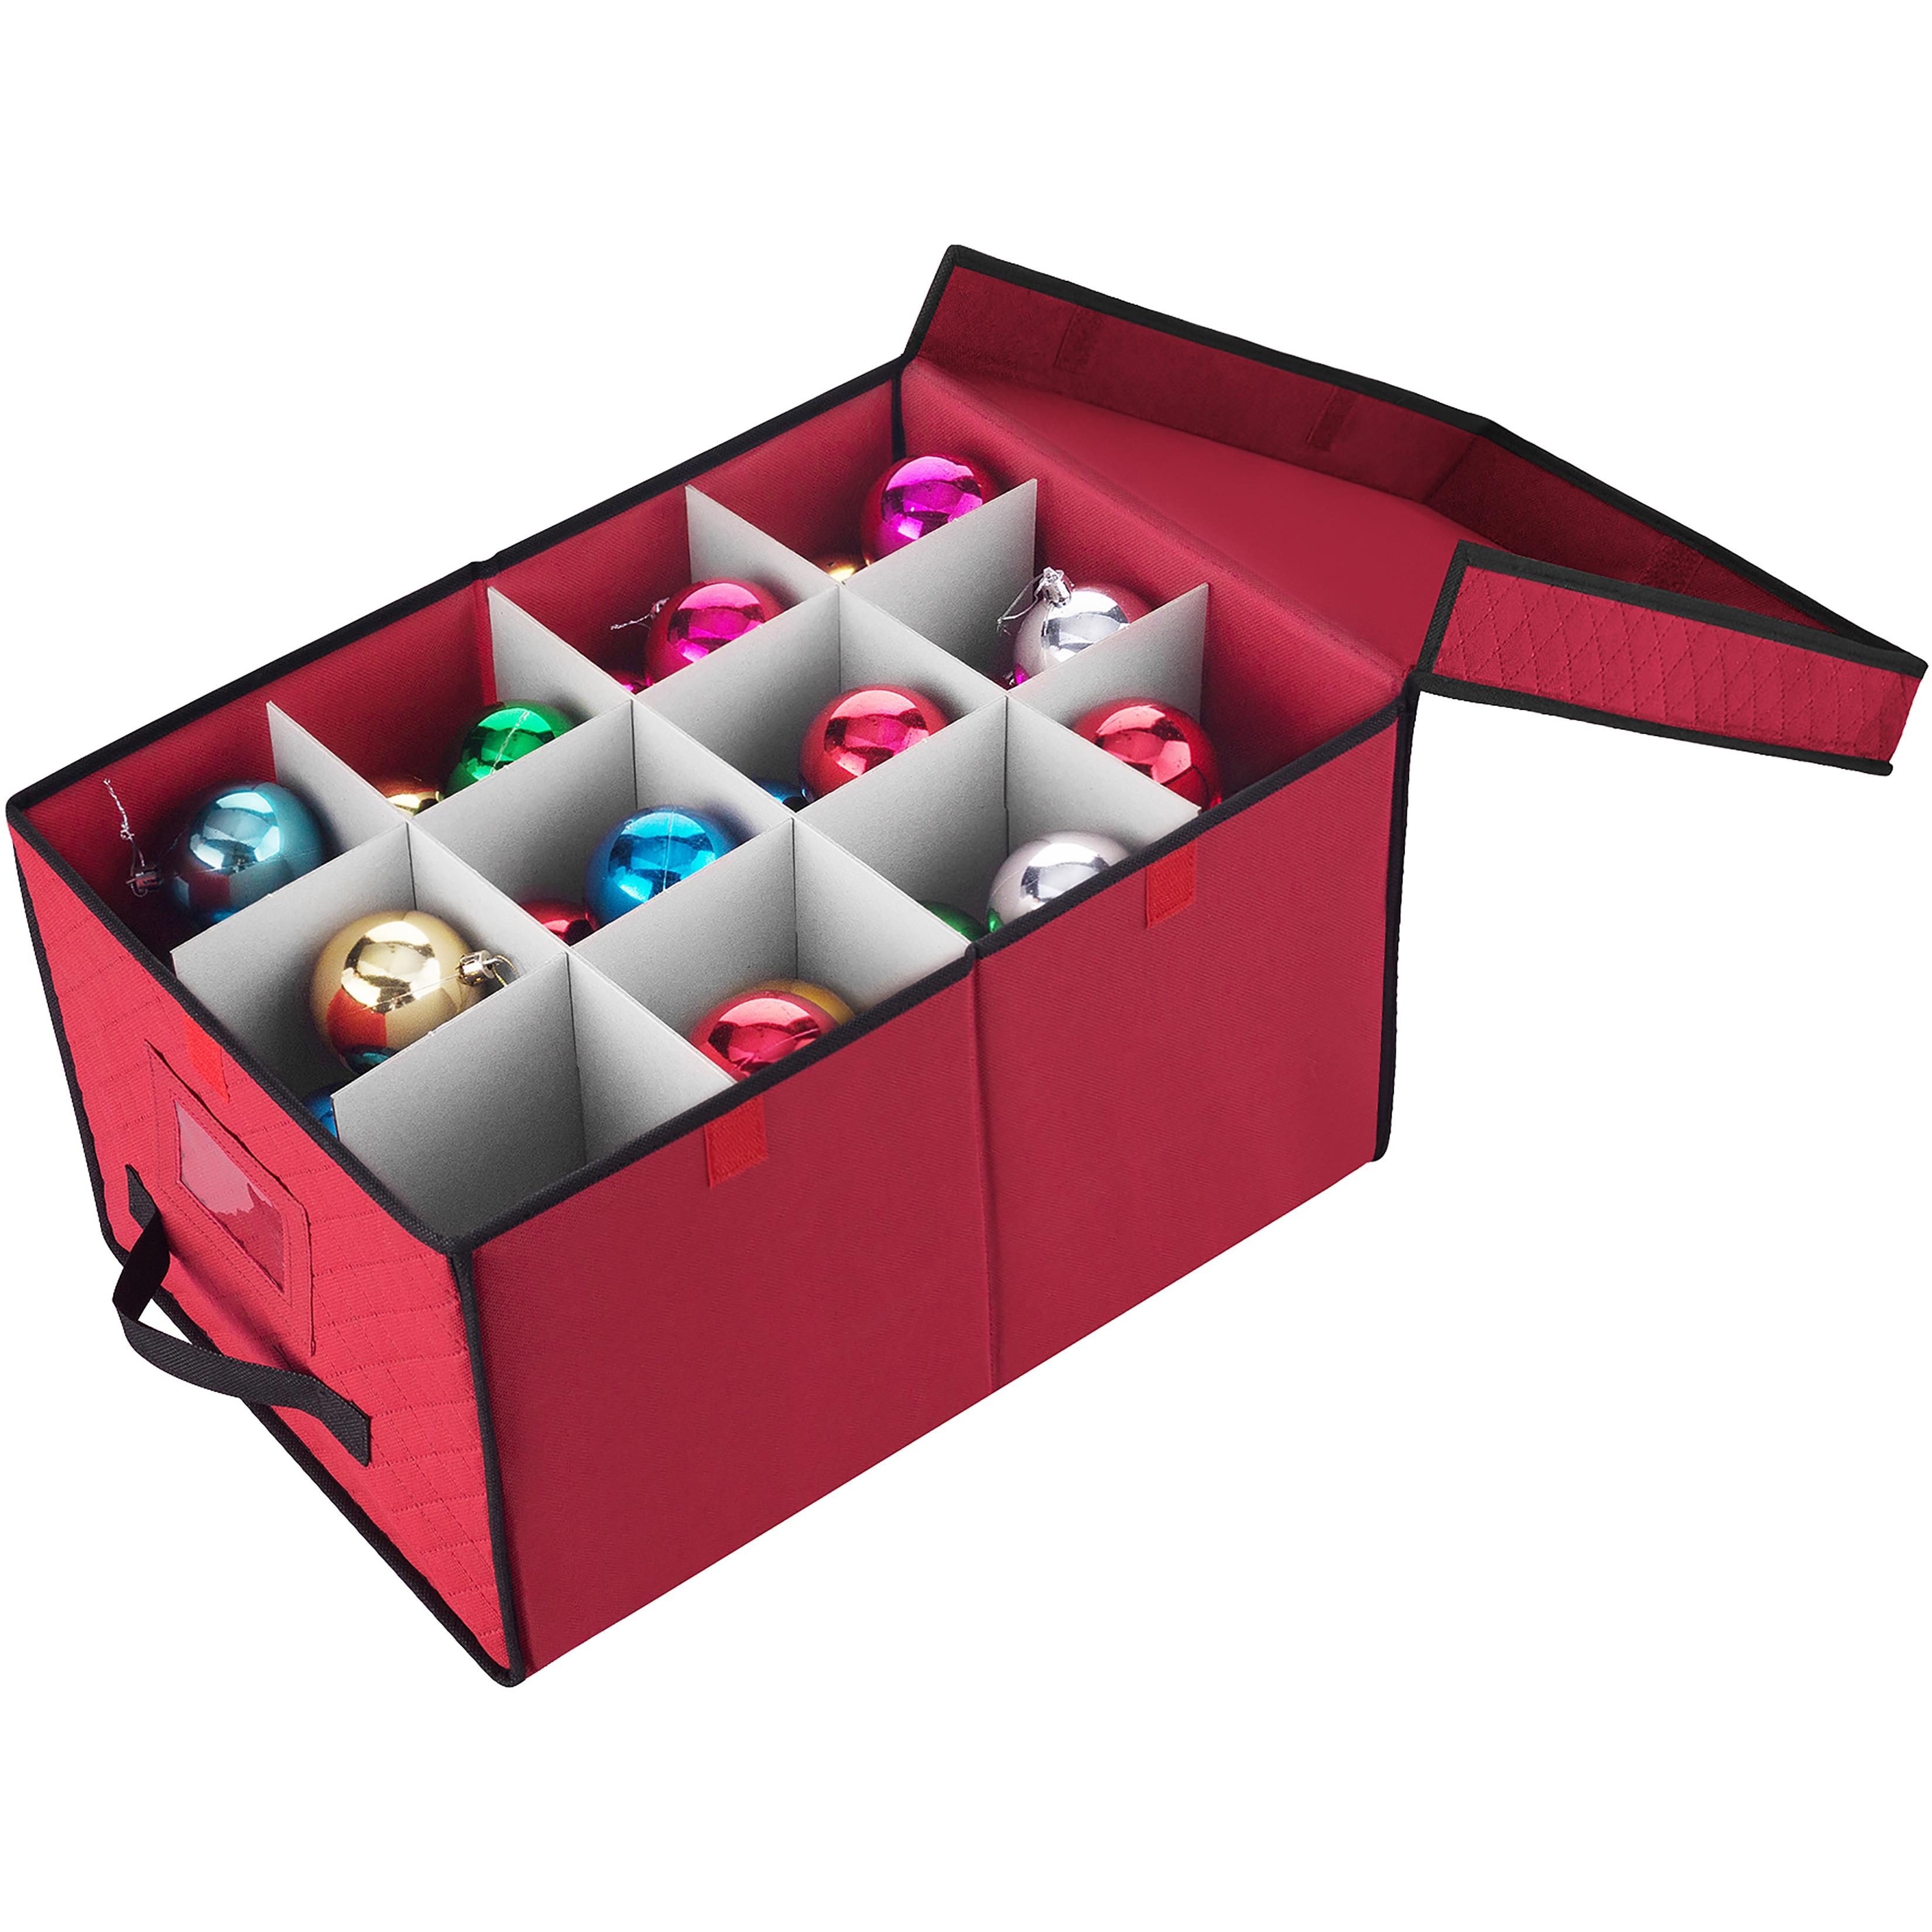 "Elf Stor Ornament Storage Chest (Red, 17'x12""X10""), Multi..."